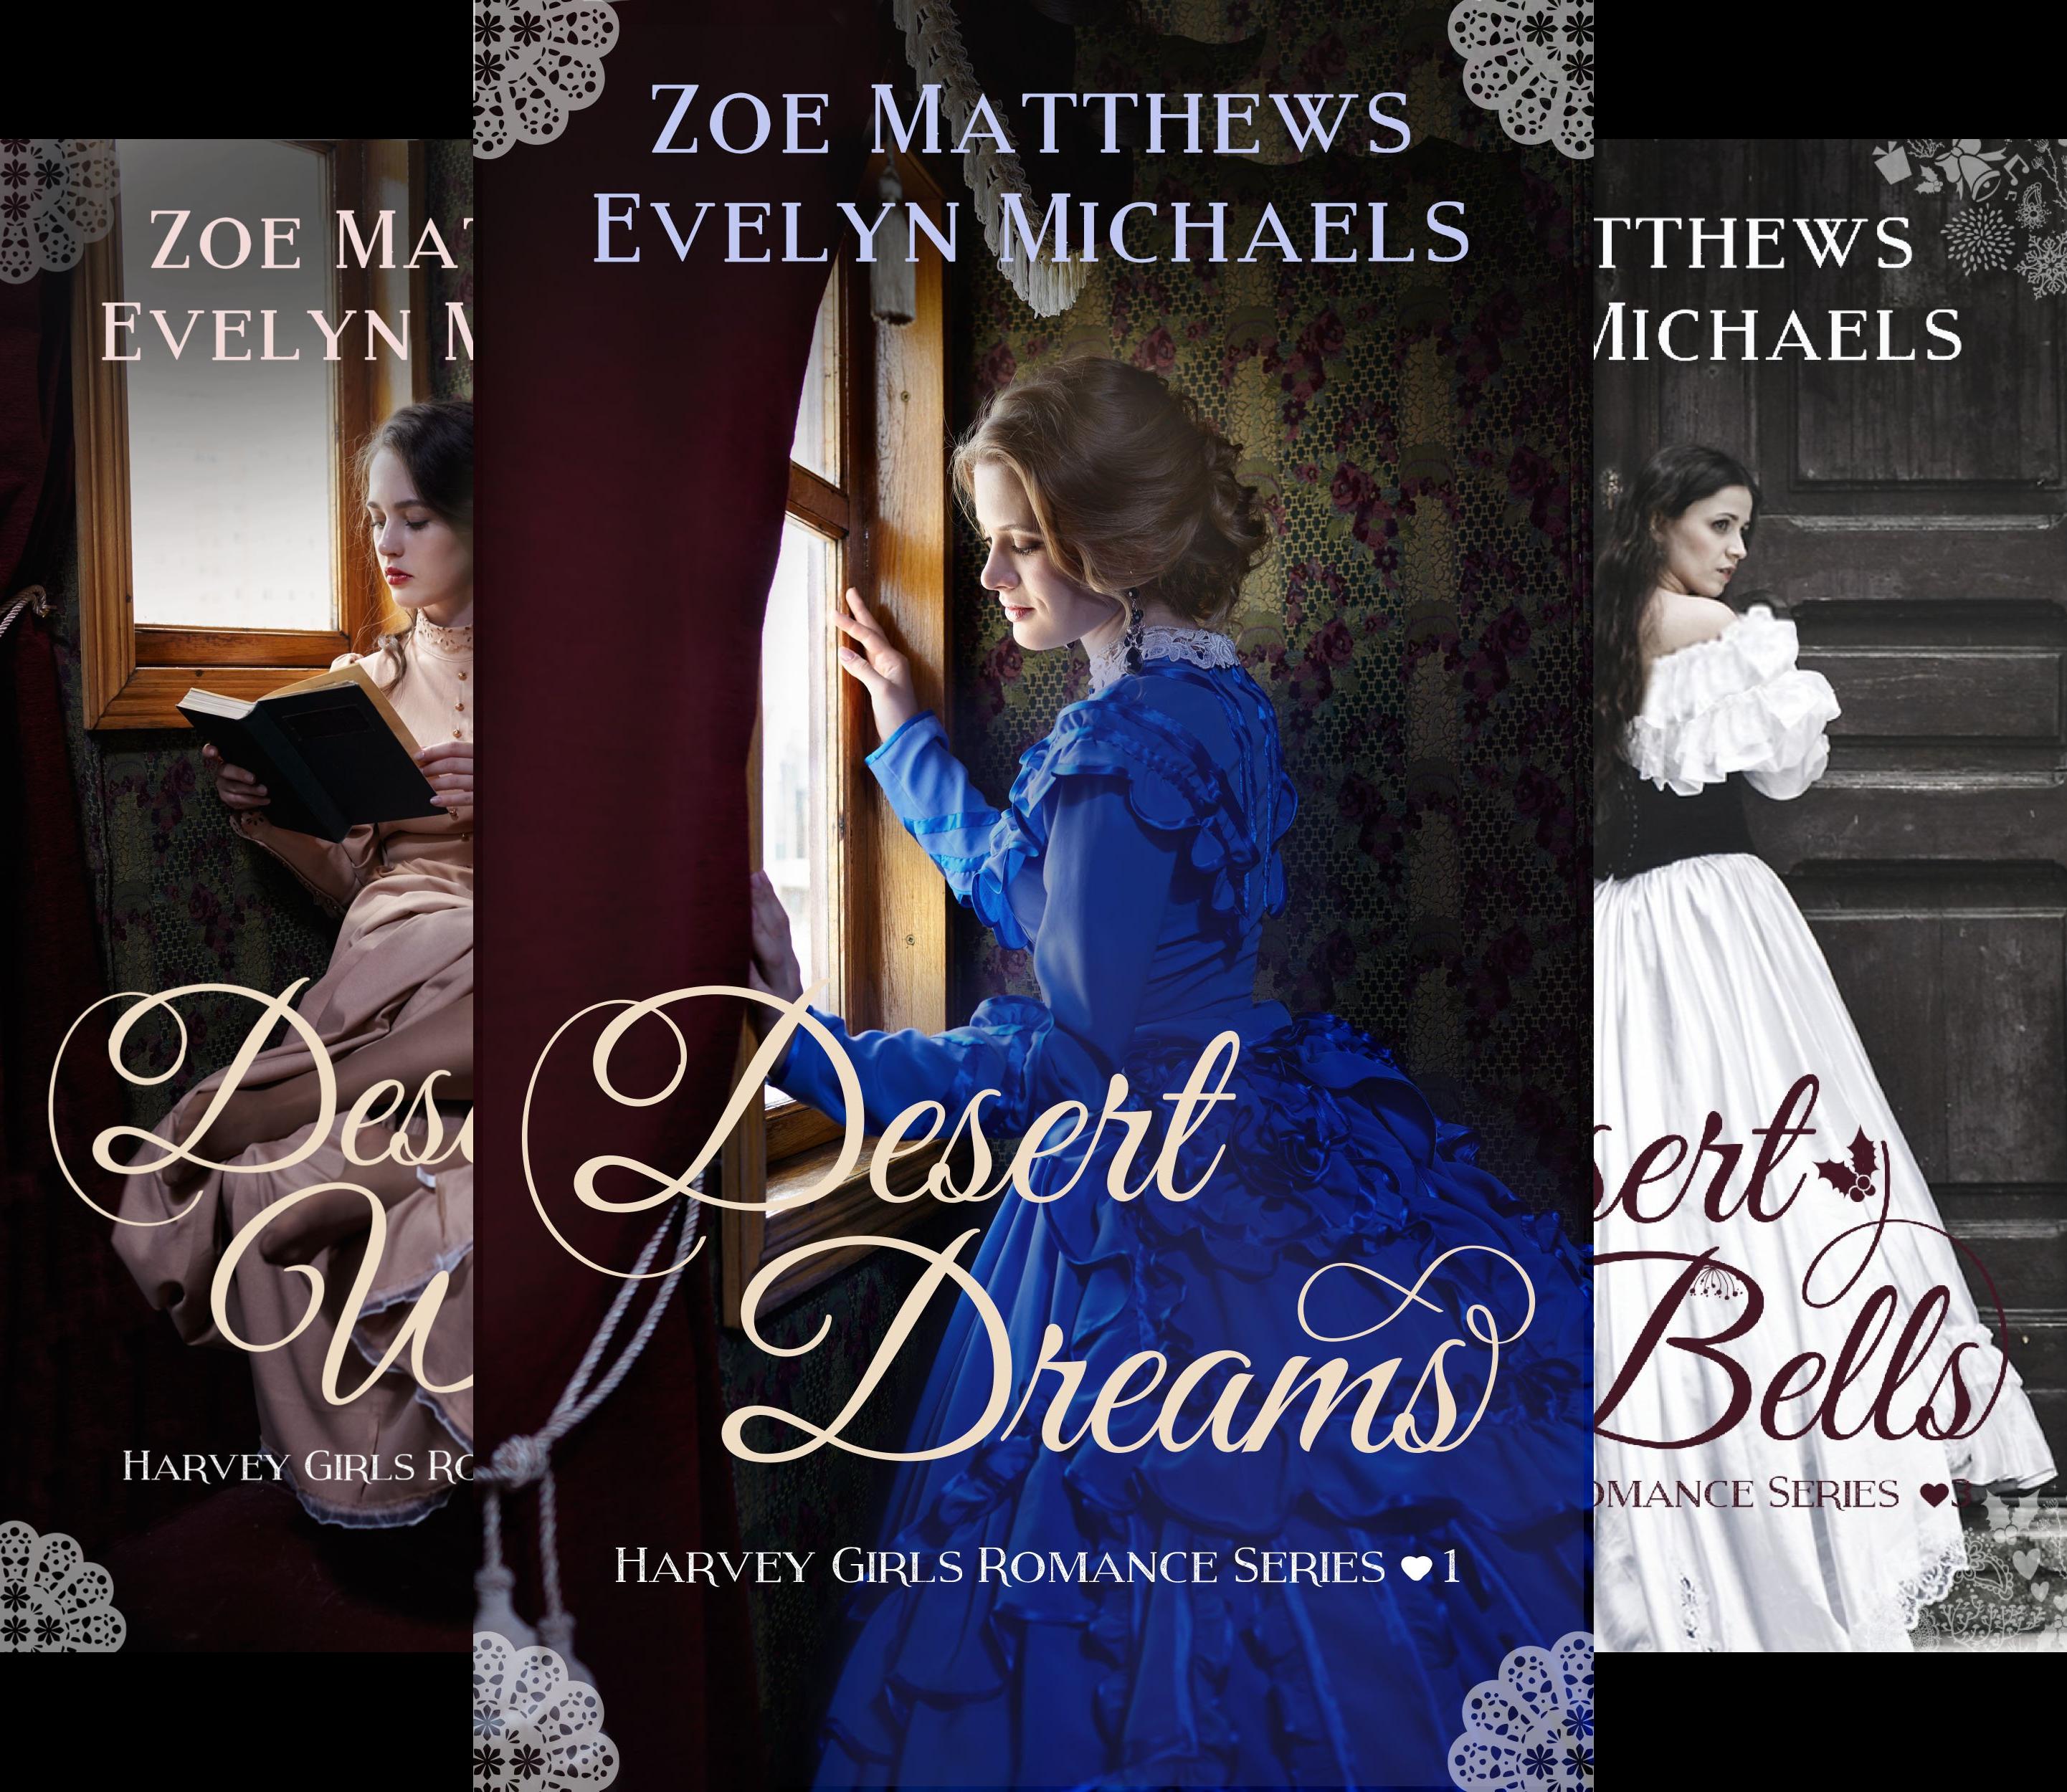 Harvey Girls Romance Series (4 Book Series)